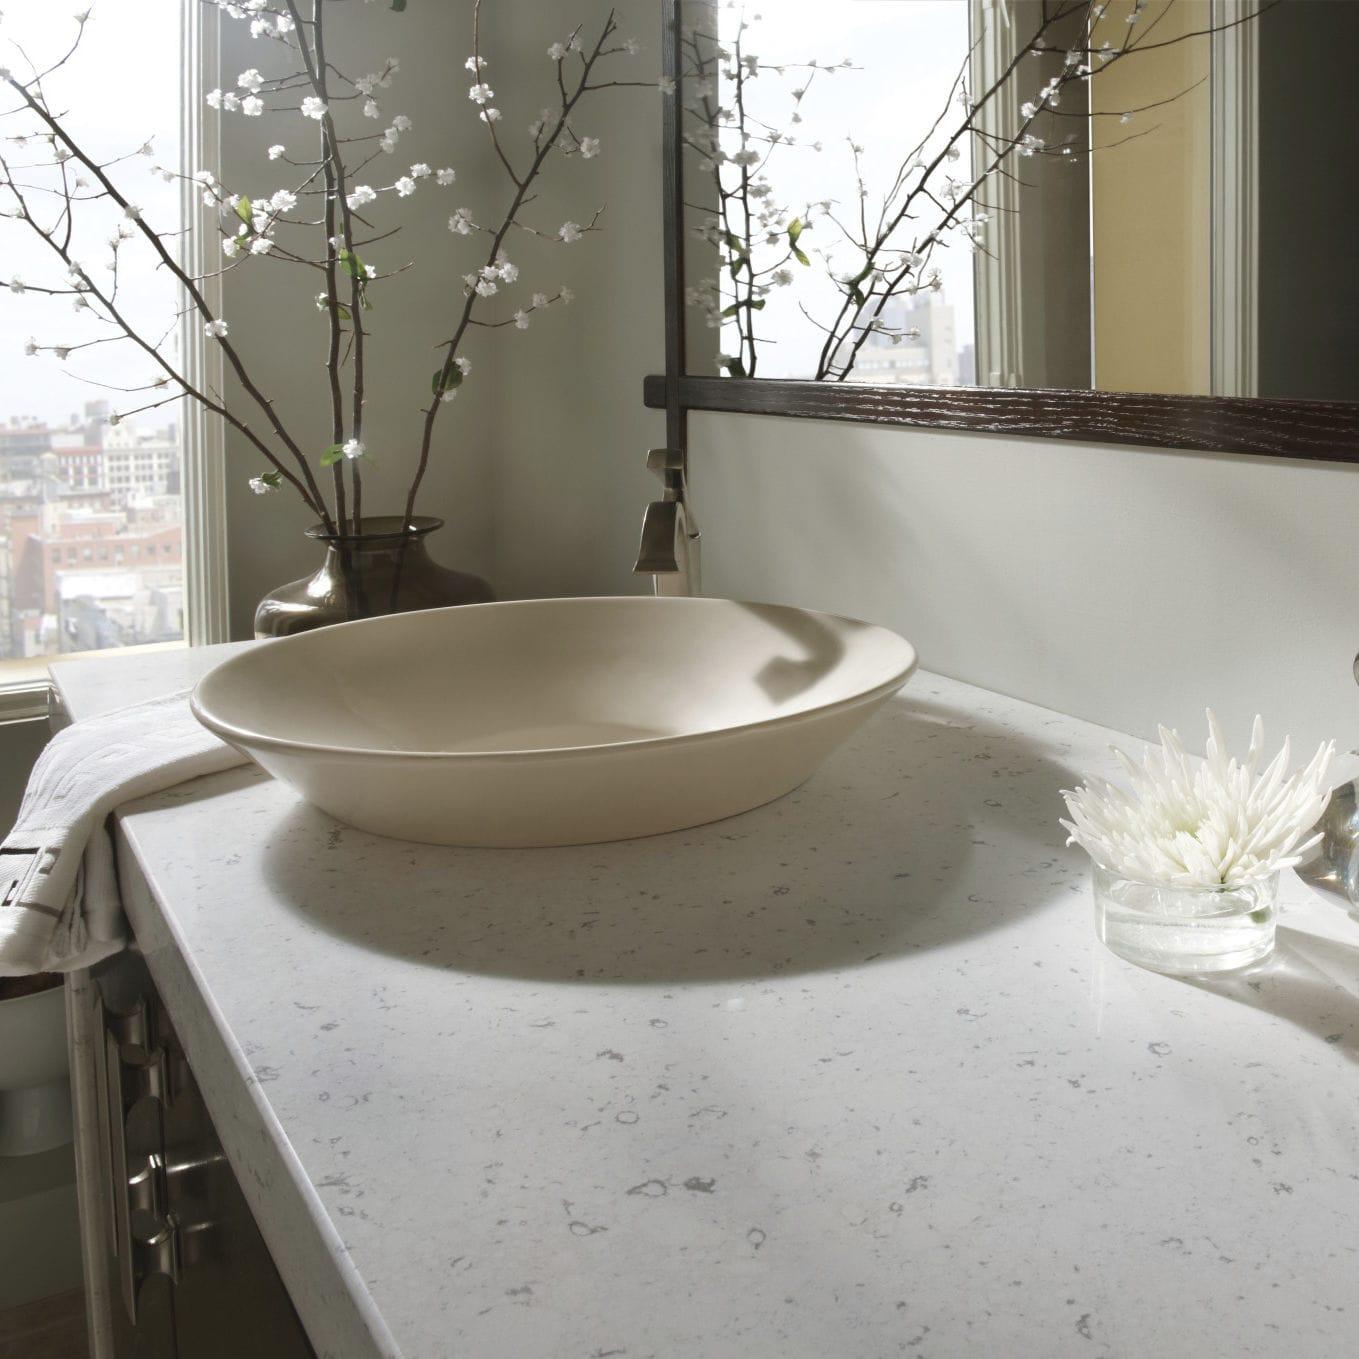 Salle De Bain Couleur Beige ~ plan vasque en silestone bianco rivers cosentino